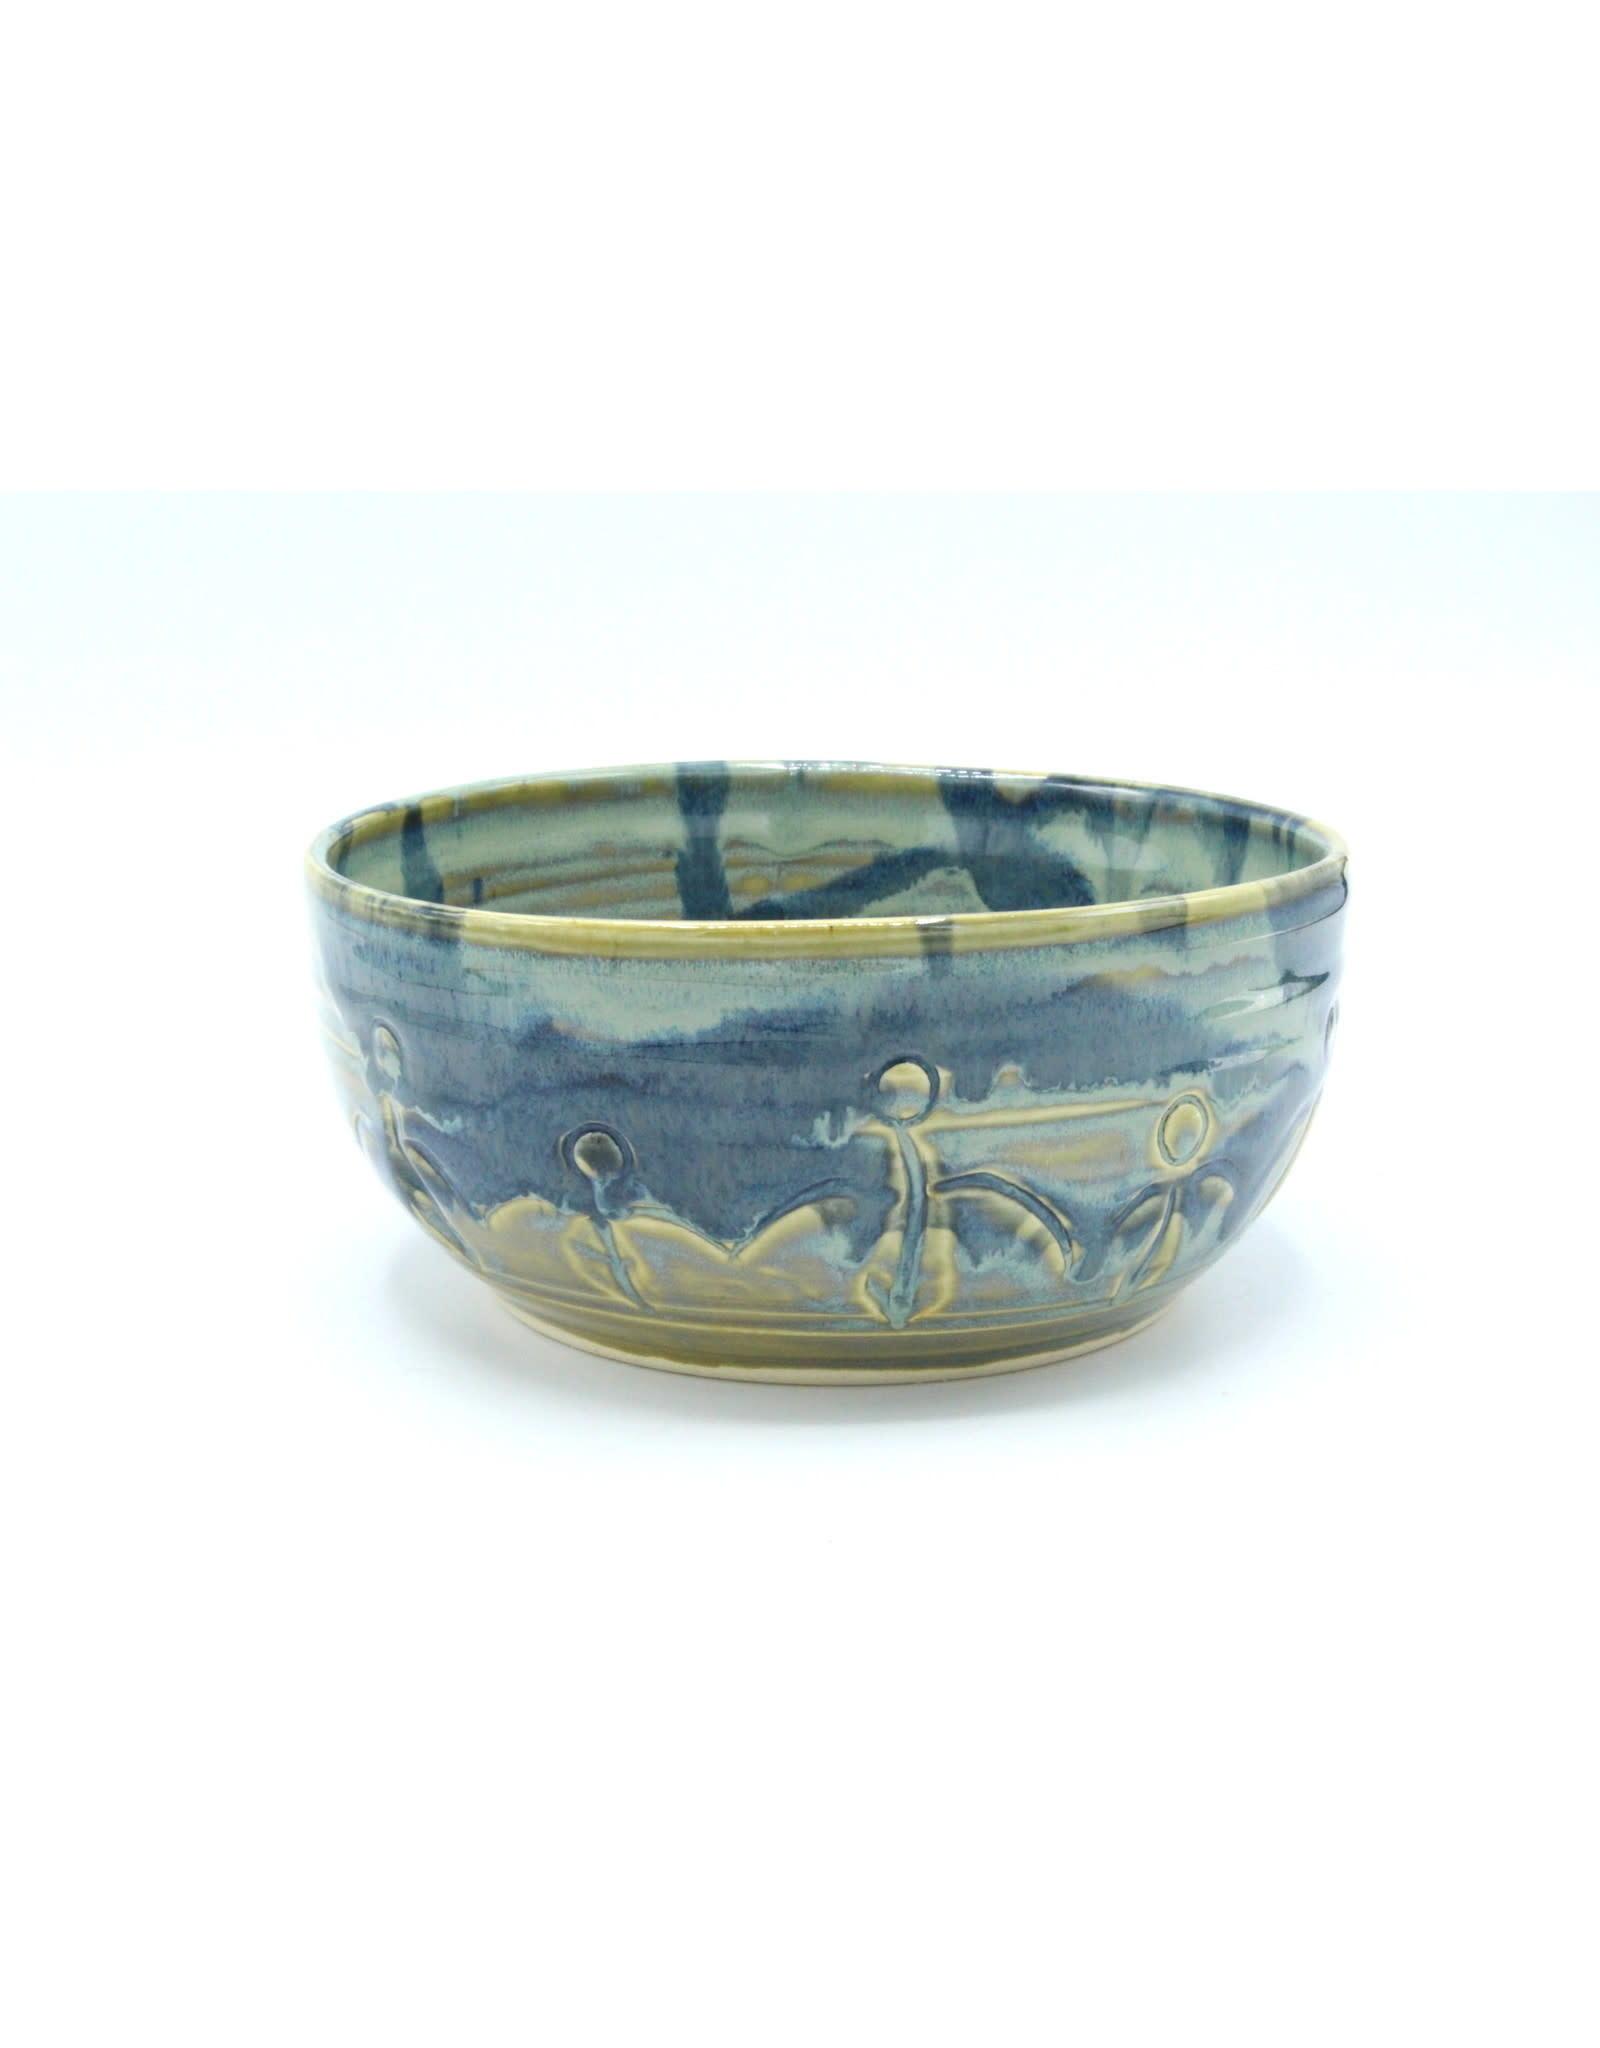 Medium Friendship Bowl - Green